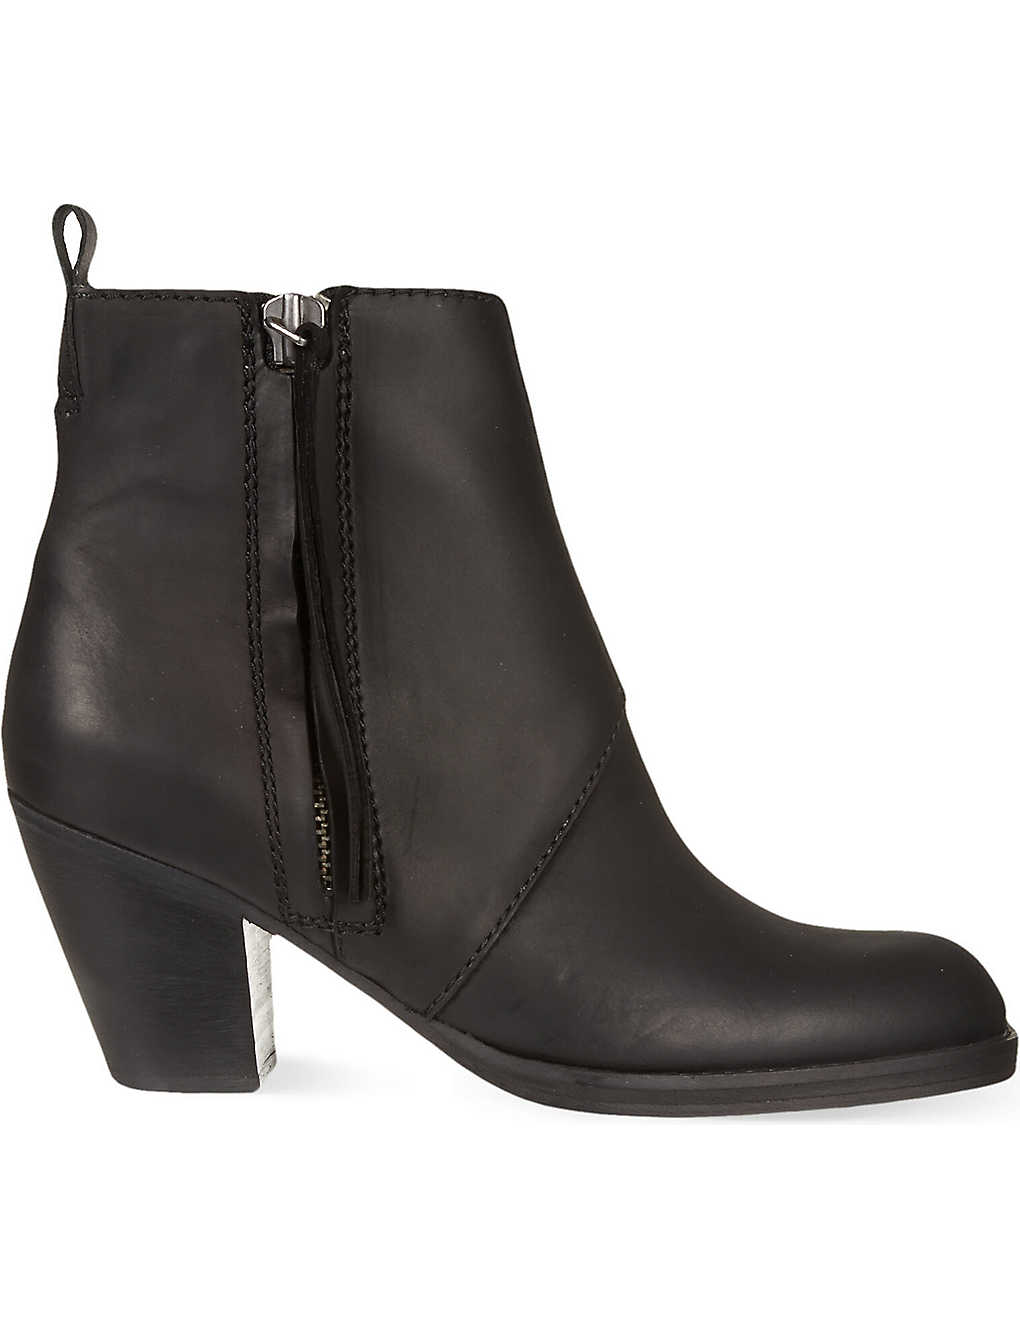 ACNE STUDIOS - Pistol Short leather ankle boots  d8bb6f8dd